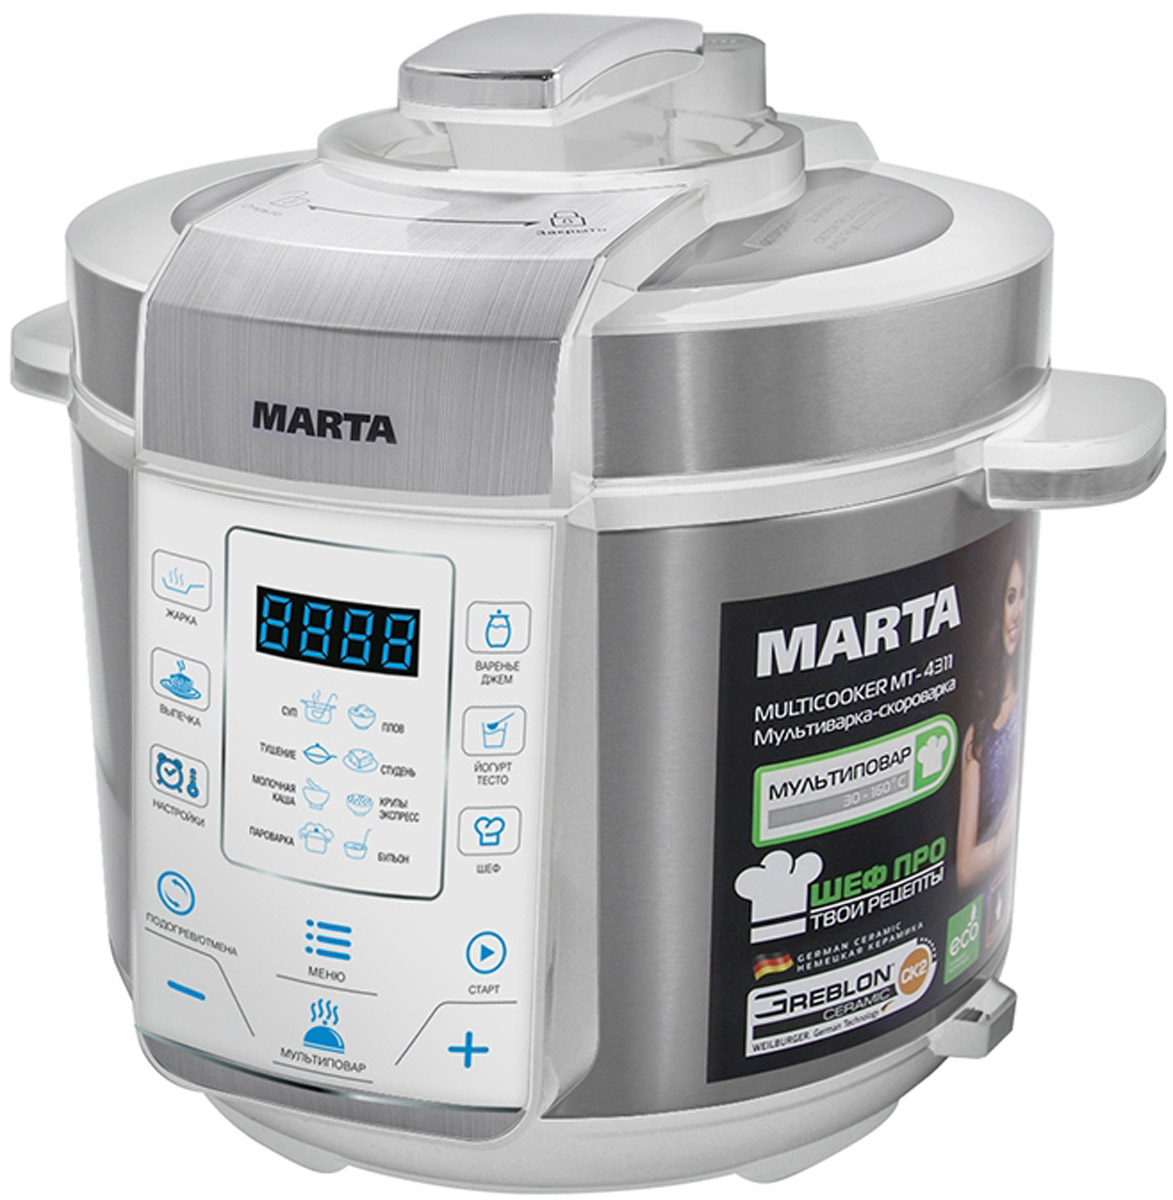 Marta MT-4311, White Steel мультиварка - Мультиварки